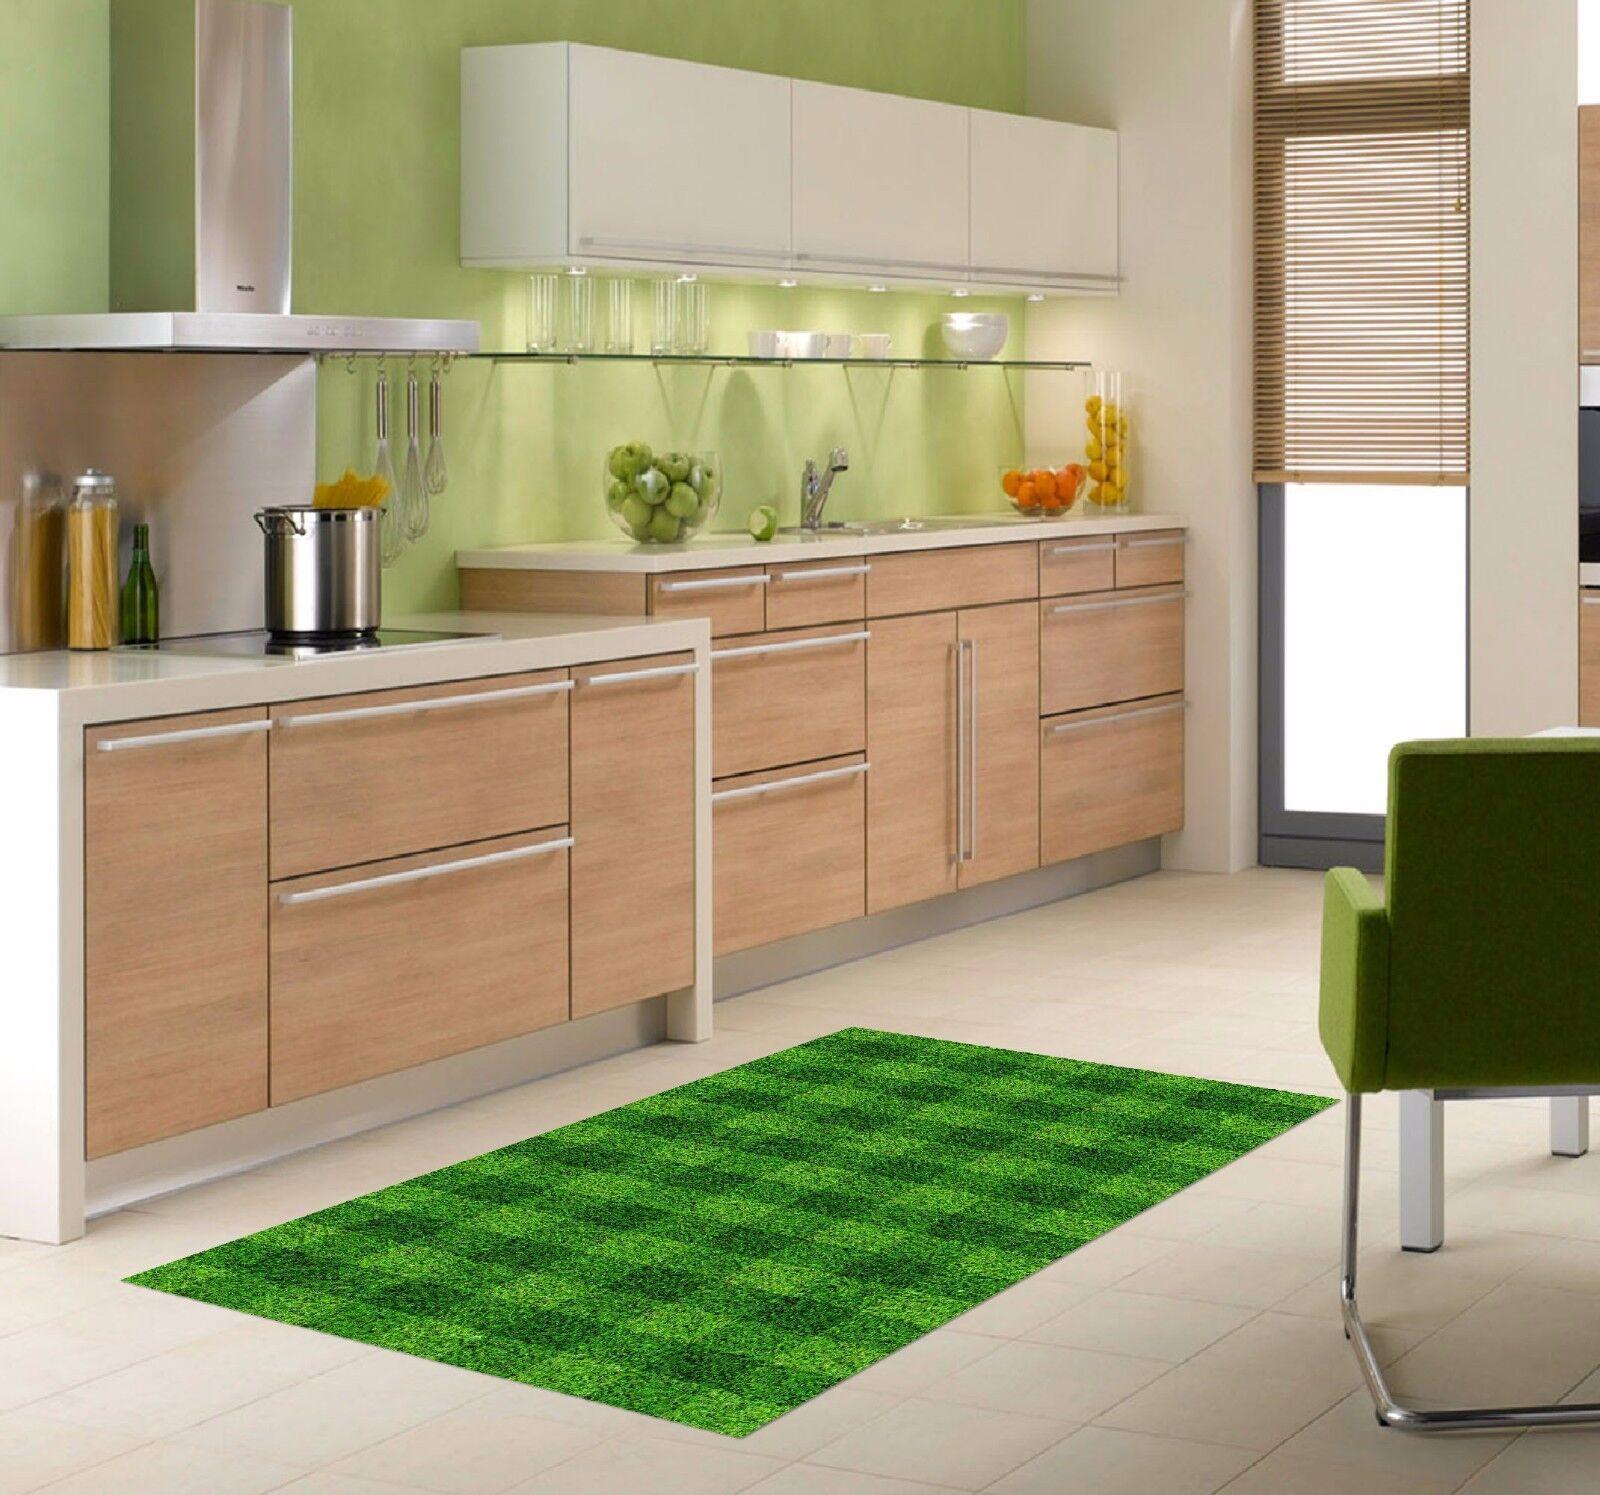 3D Grass Lattice Kitchen Mat Floor Murals Wall Print Wall Deco AJ WALLPAPER AU